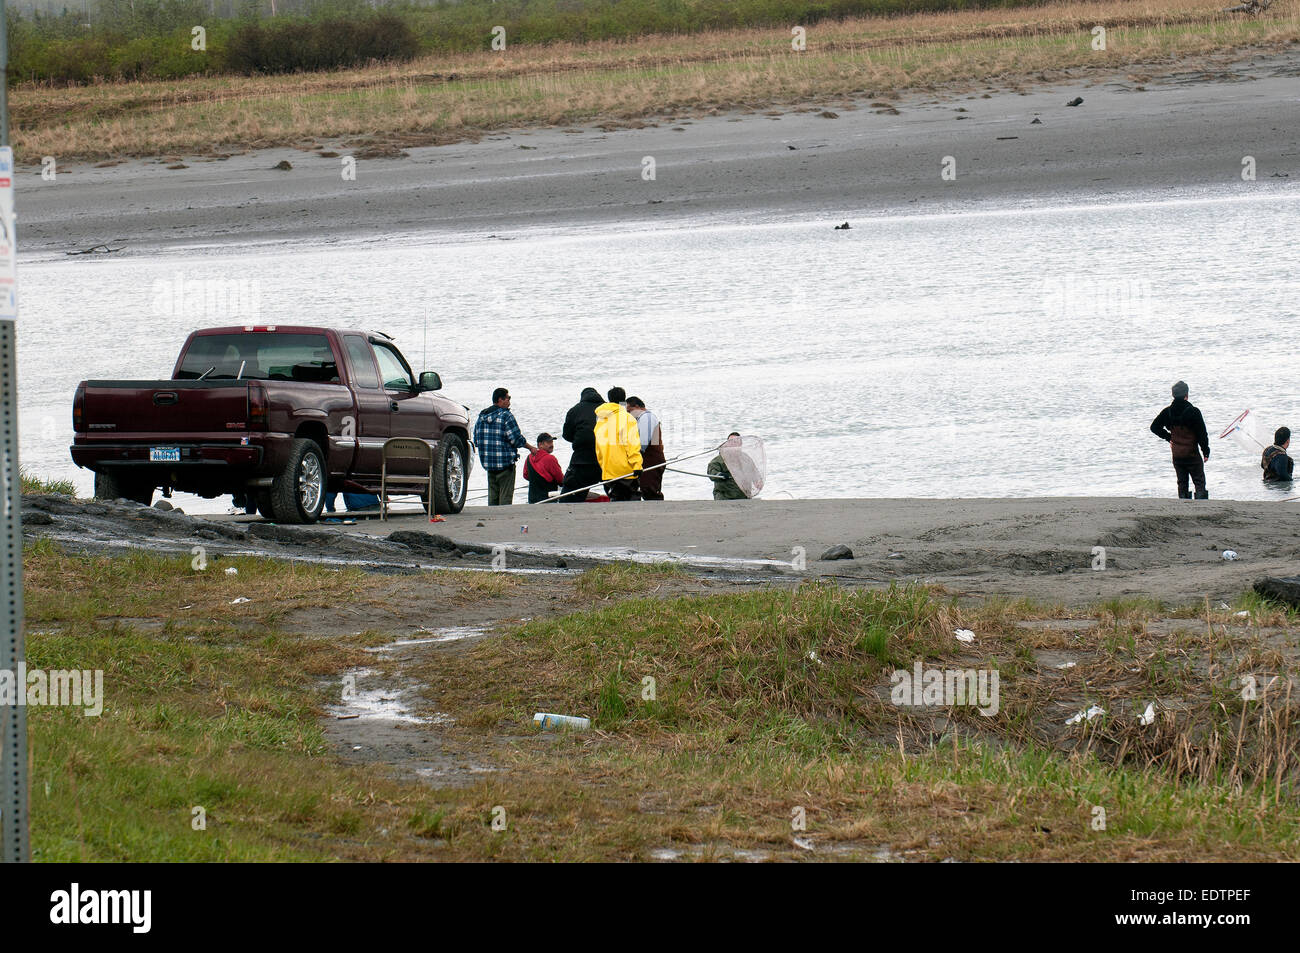 Dipnetting for Hooligans (Herring) at 20 mile river - Stock Image